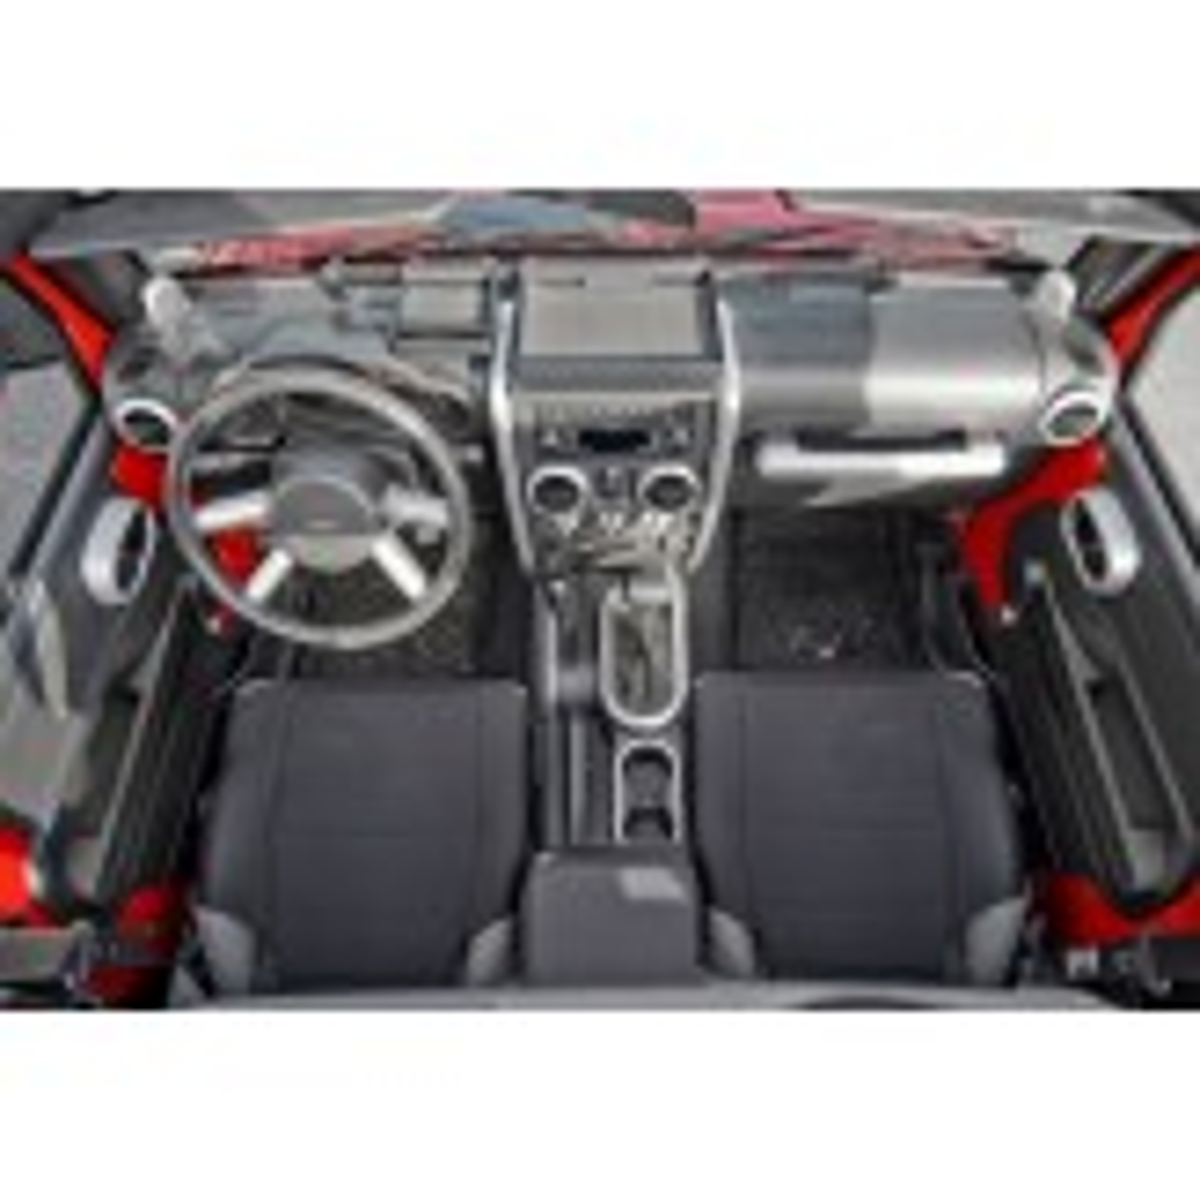 Interior Trim Accent Kit, Brushed Silver; 07-10 Jeep Wrangler JK